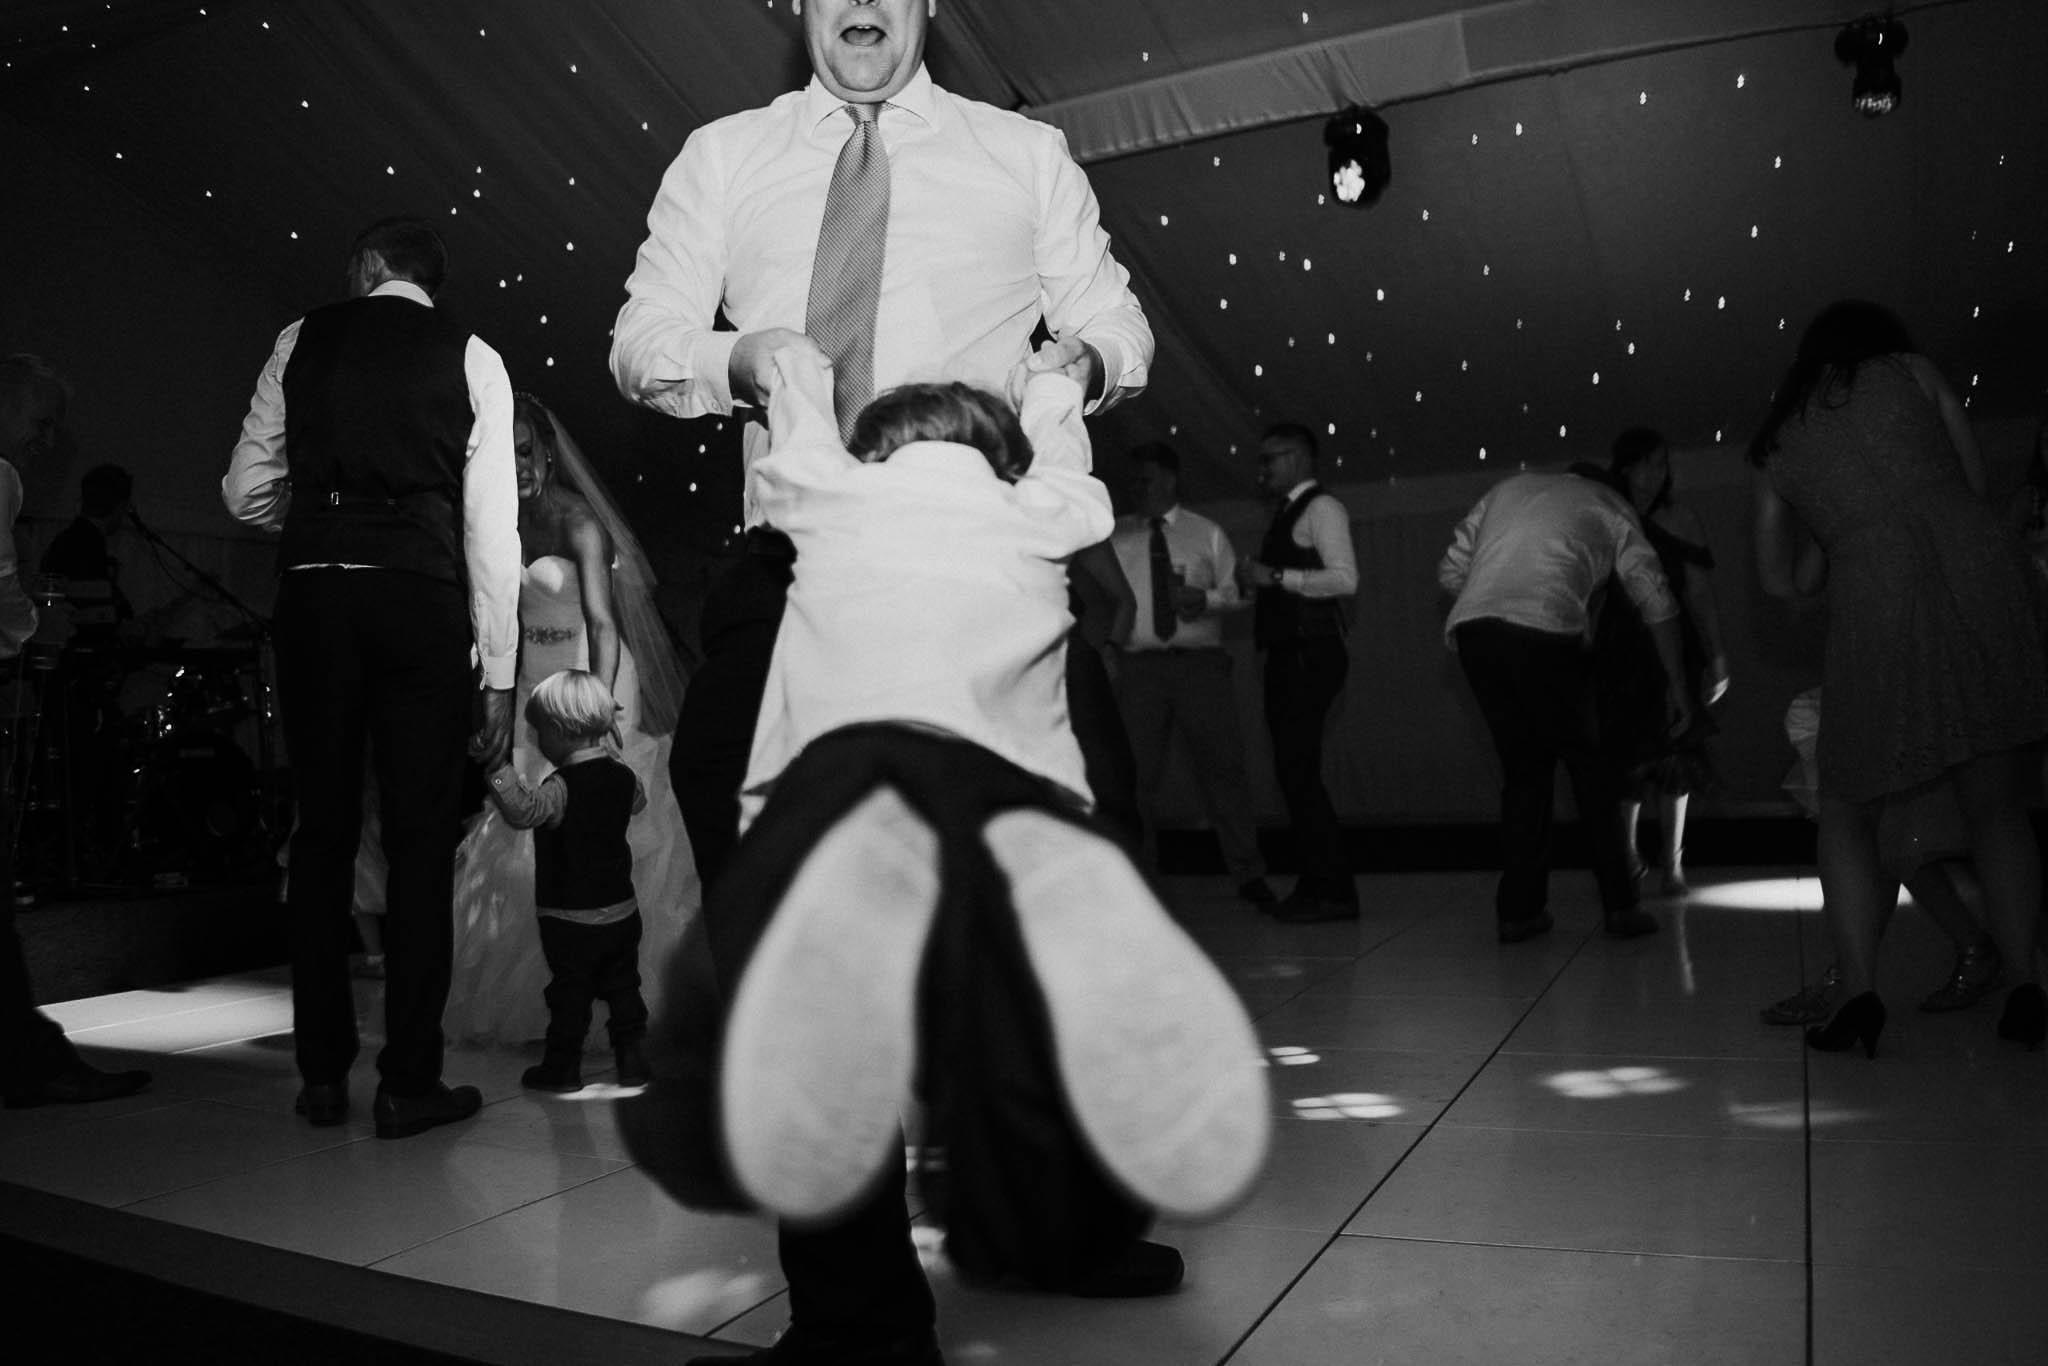 wedding-spinning-dance